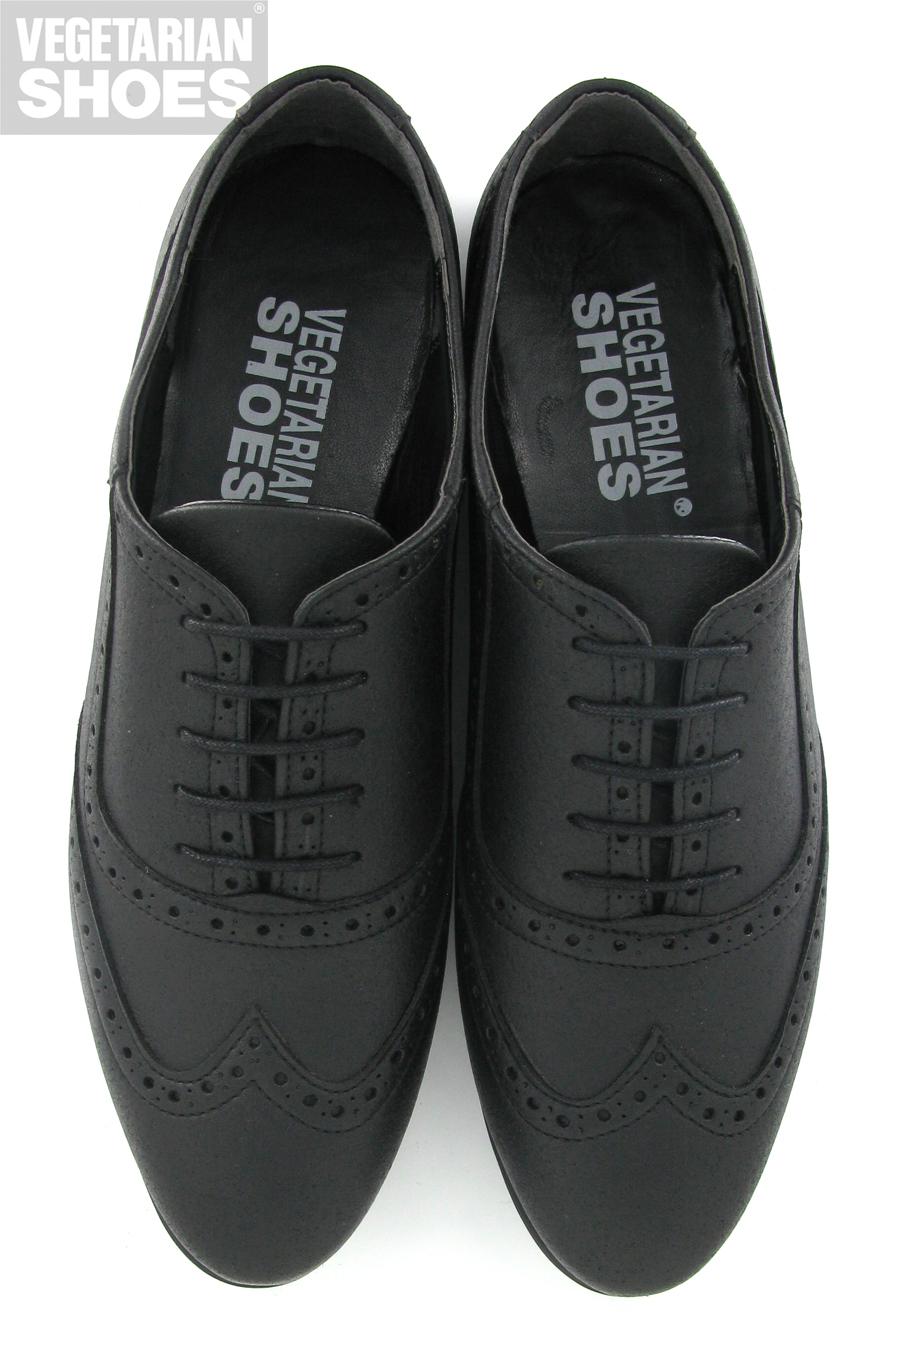 ed45479c3b5ed0 Beatrix Shoe Black - Shoes